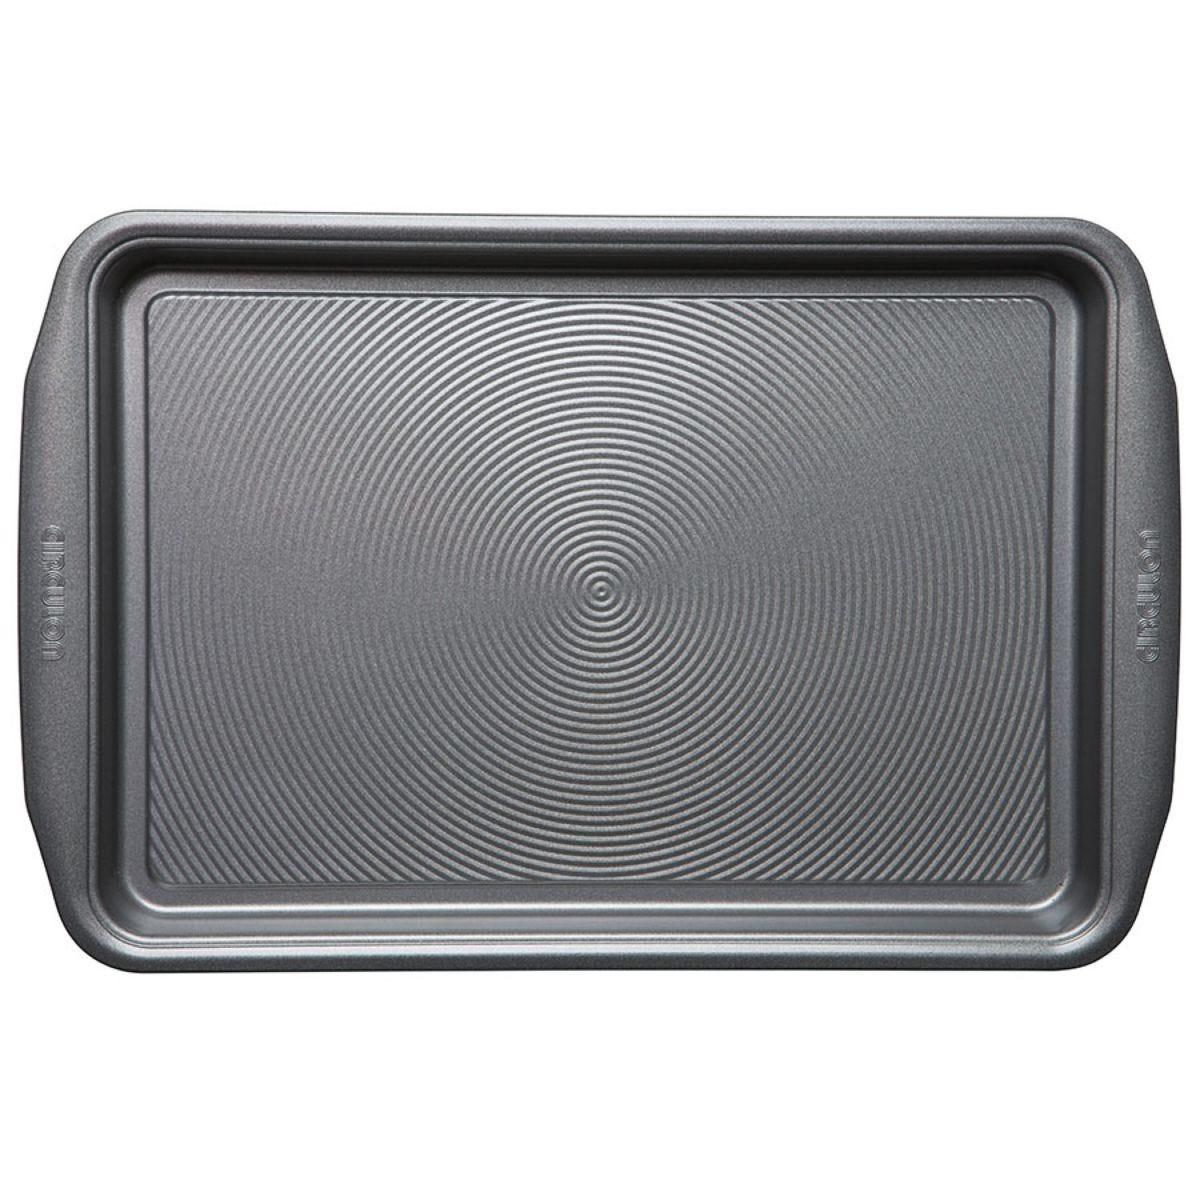 Circulon Momentum Oven Tray – 44.5cm